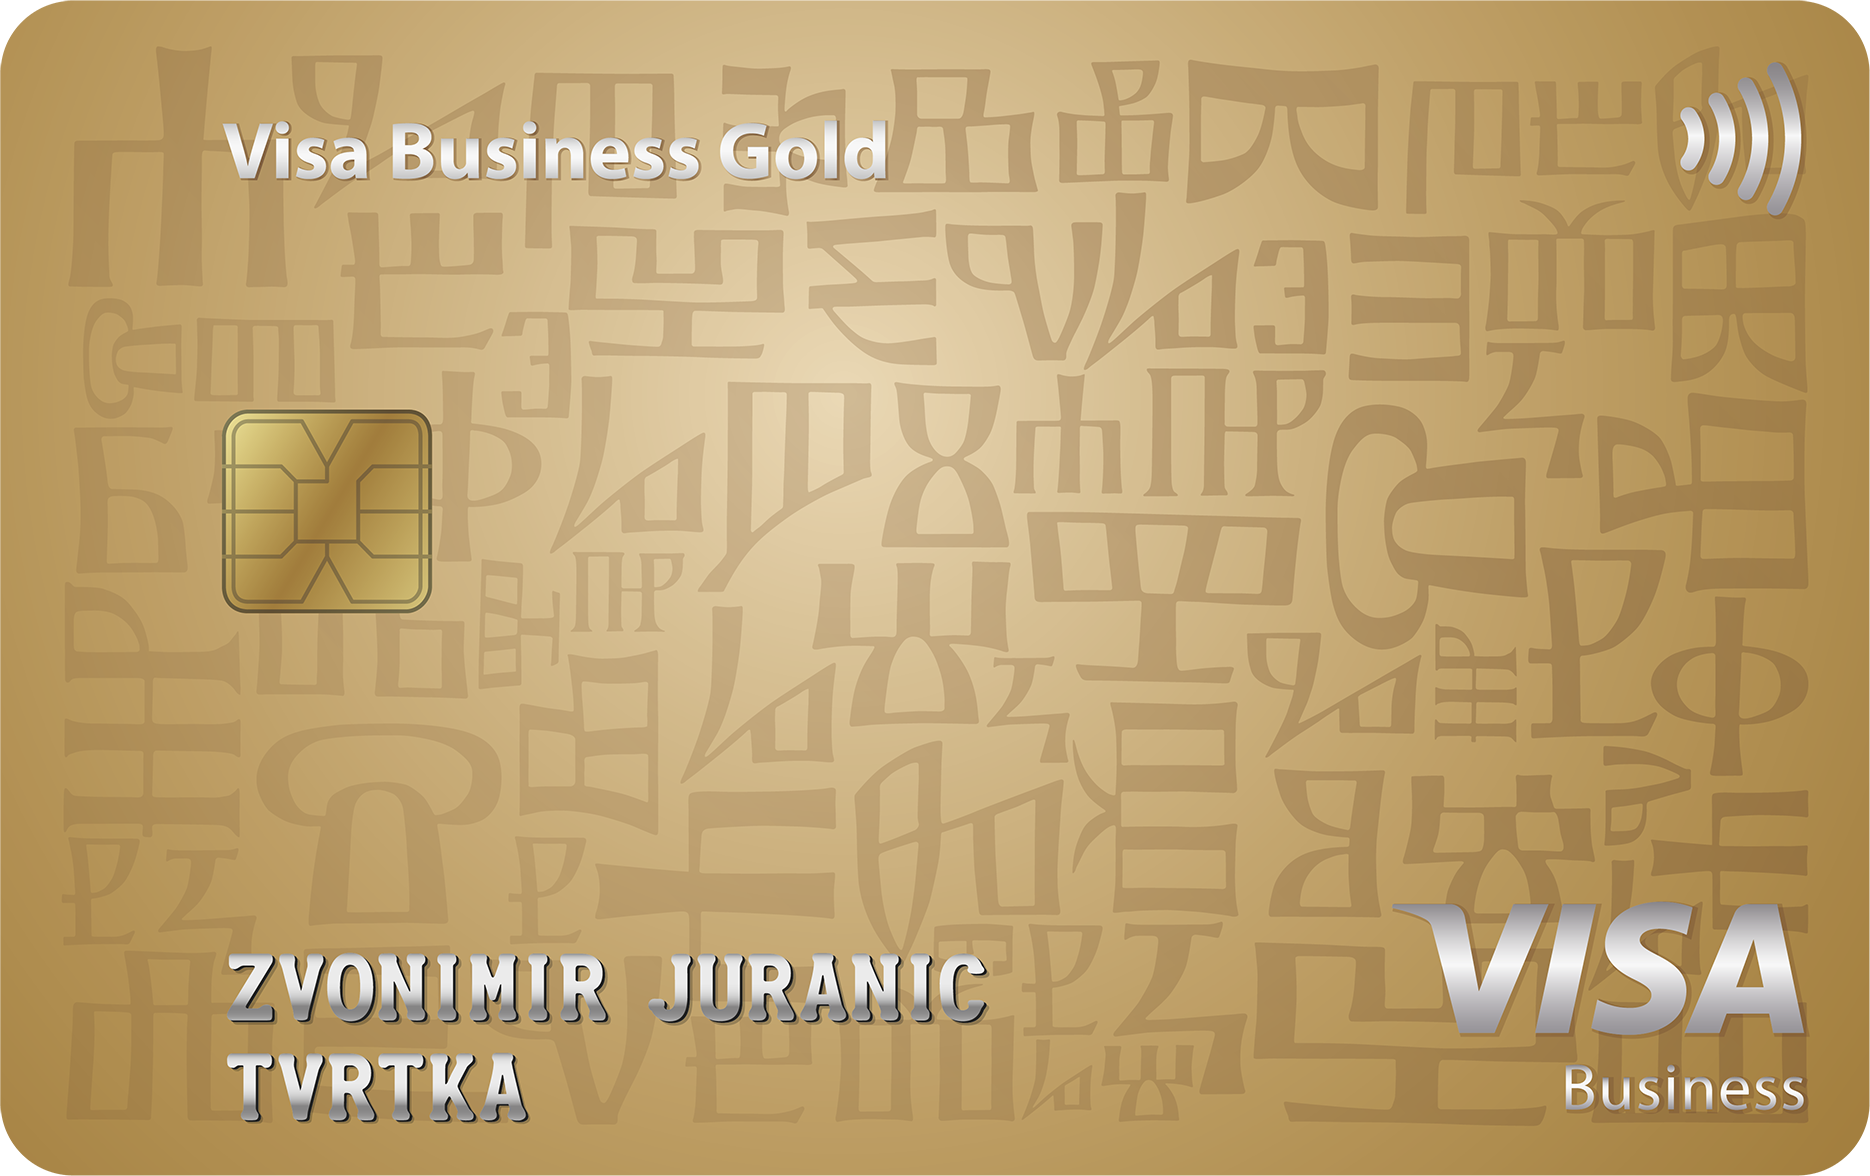 Visa Business Gold